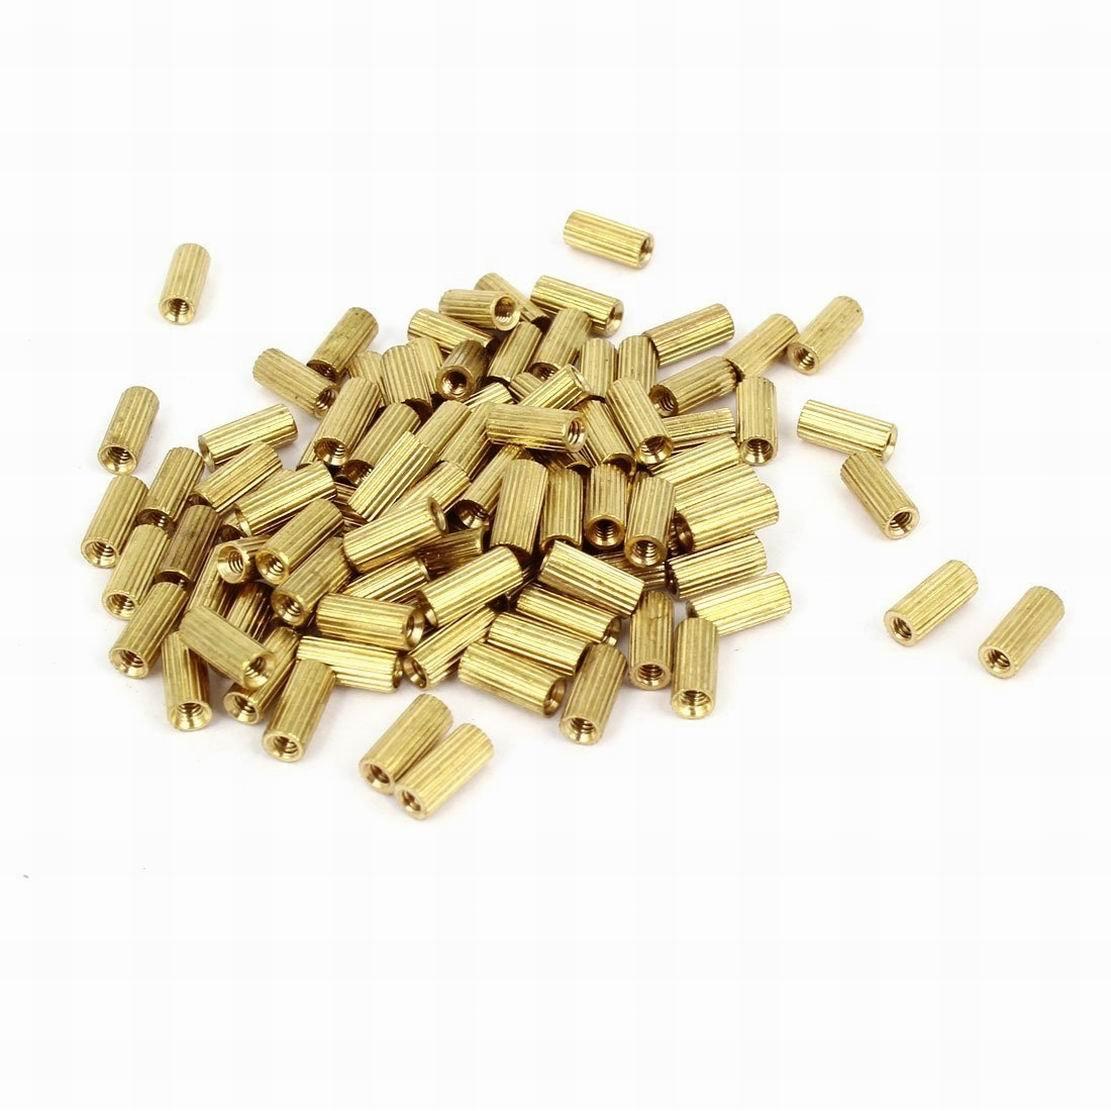 0.5 OD Female 1//4-20 Screw Size Steel Zinc Plated 3 Length, Lyn-Tron Pack of 5